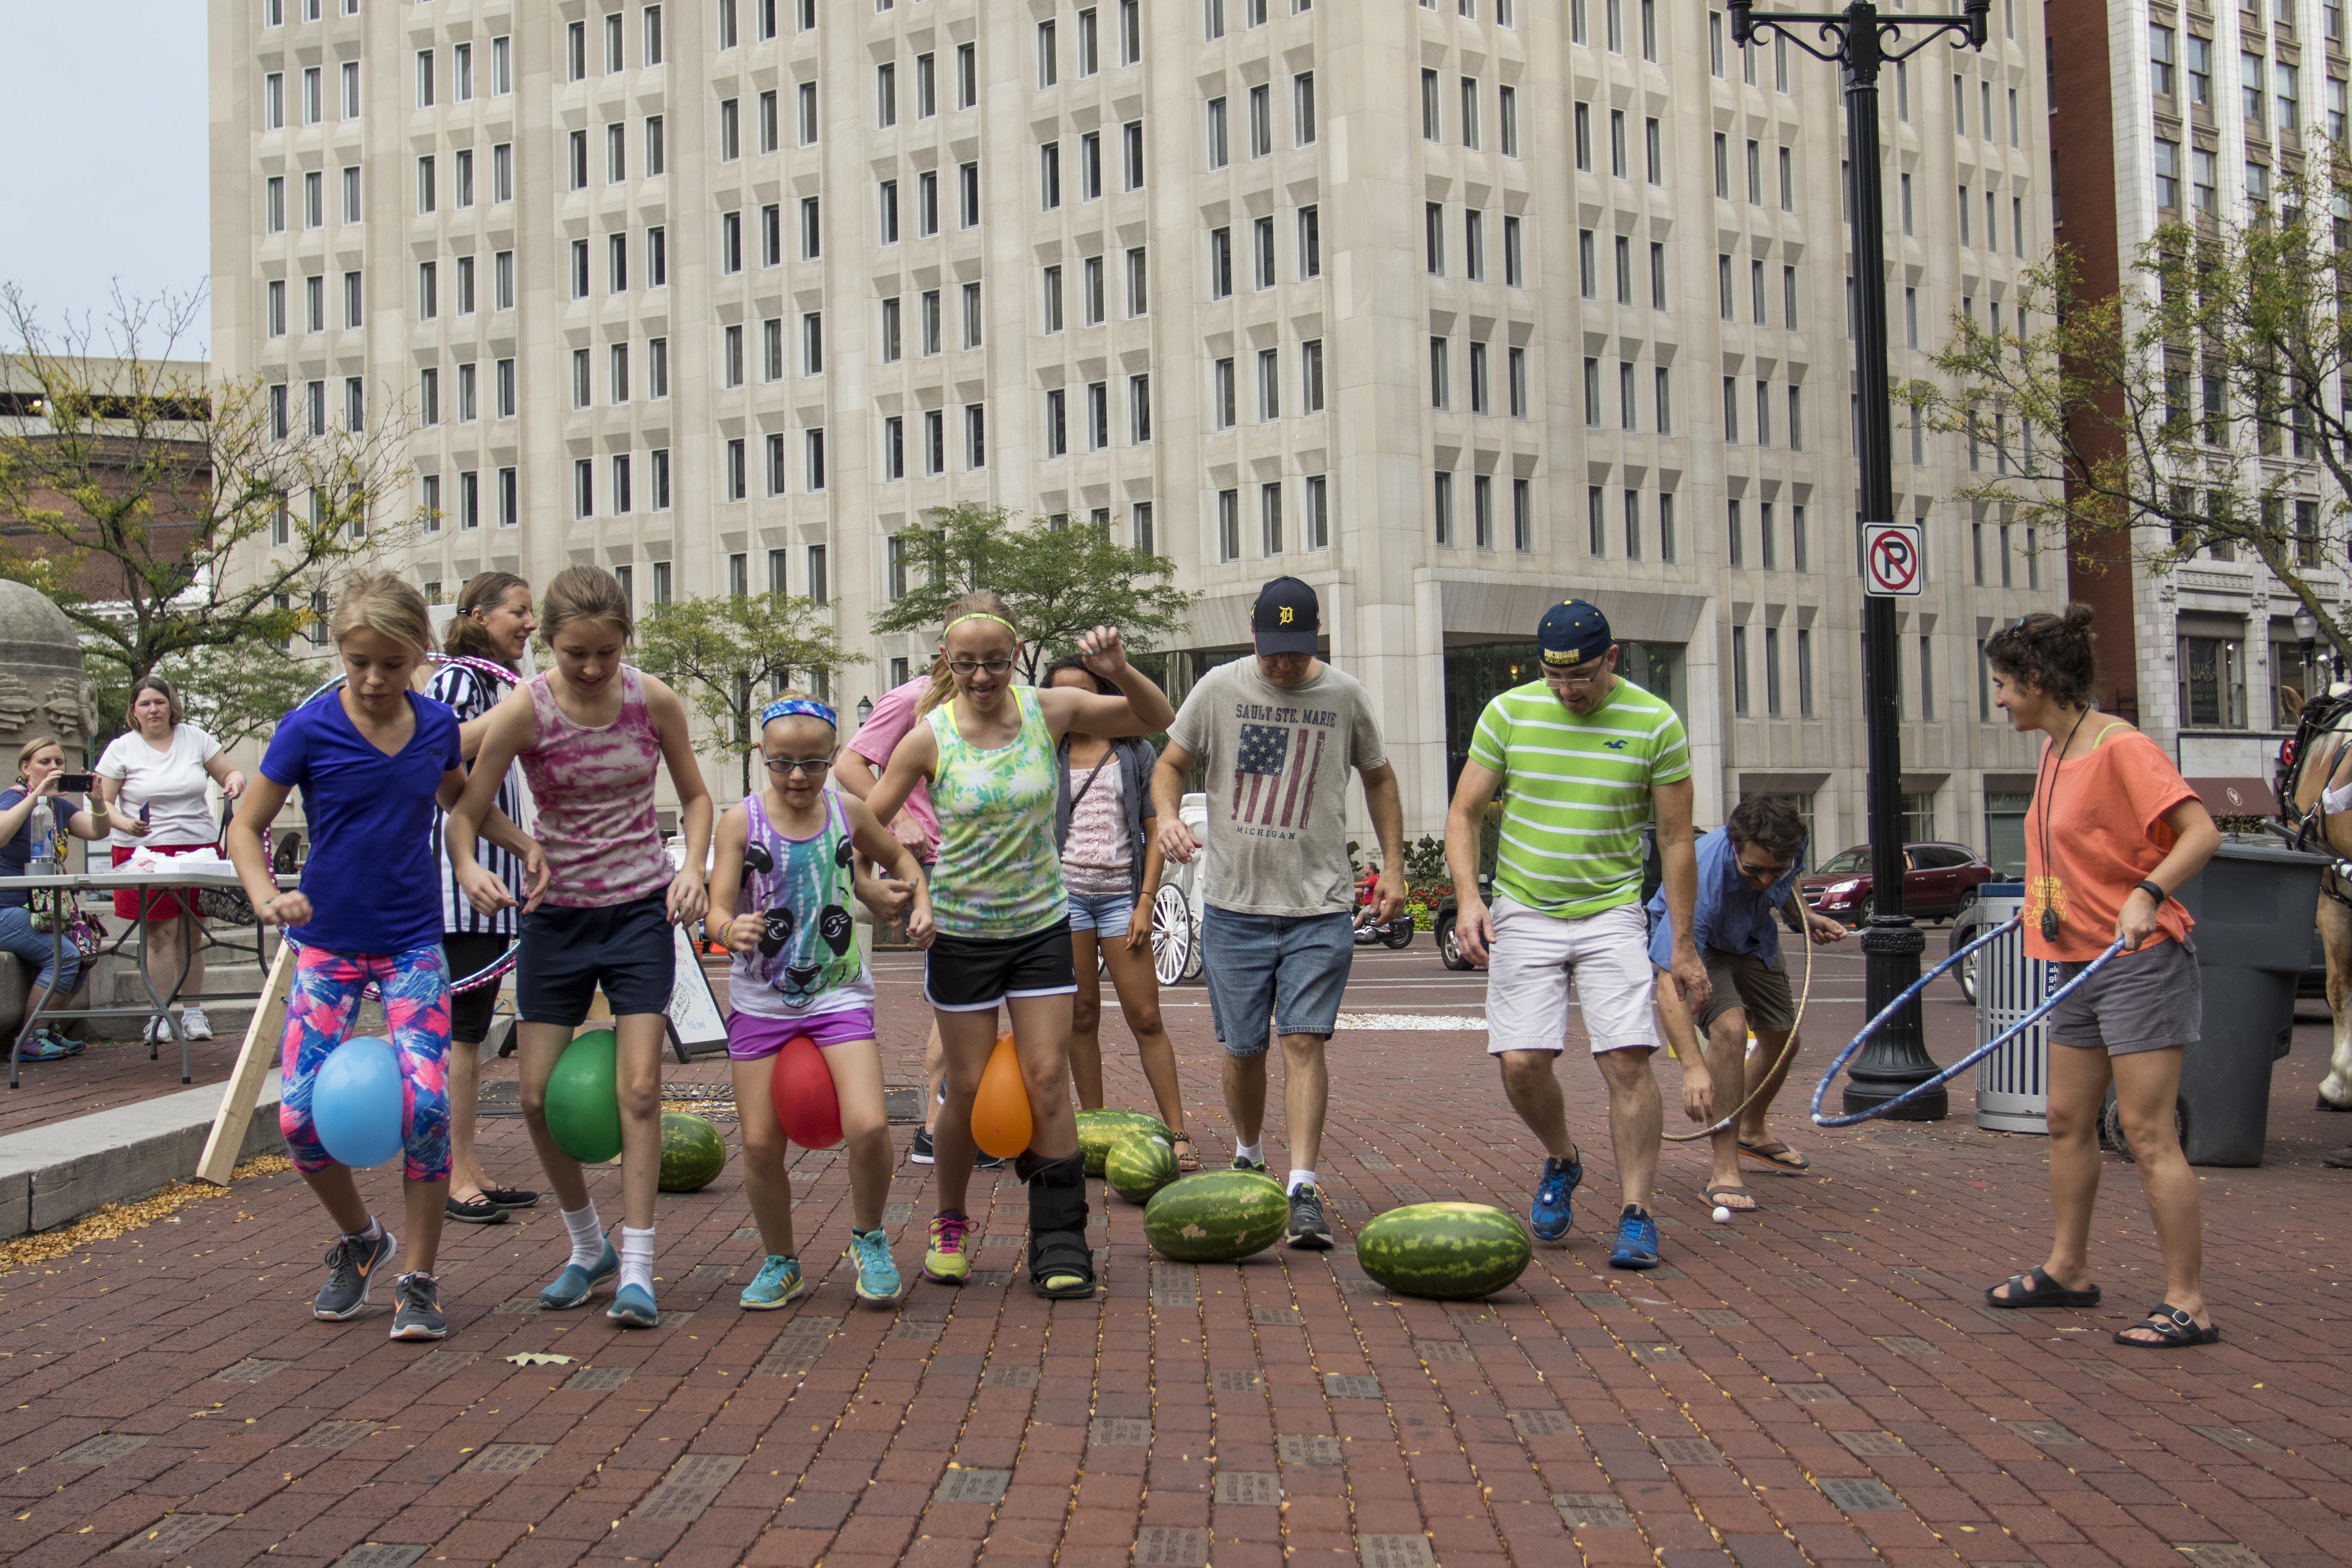 groupwatermelonballoonsparadepic